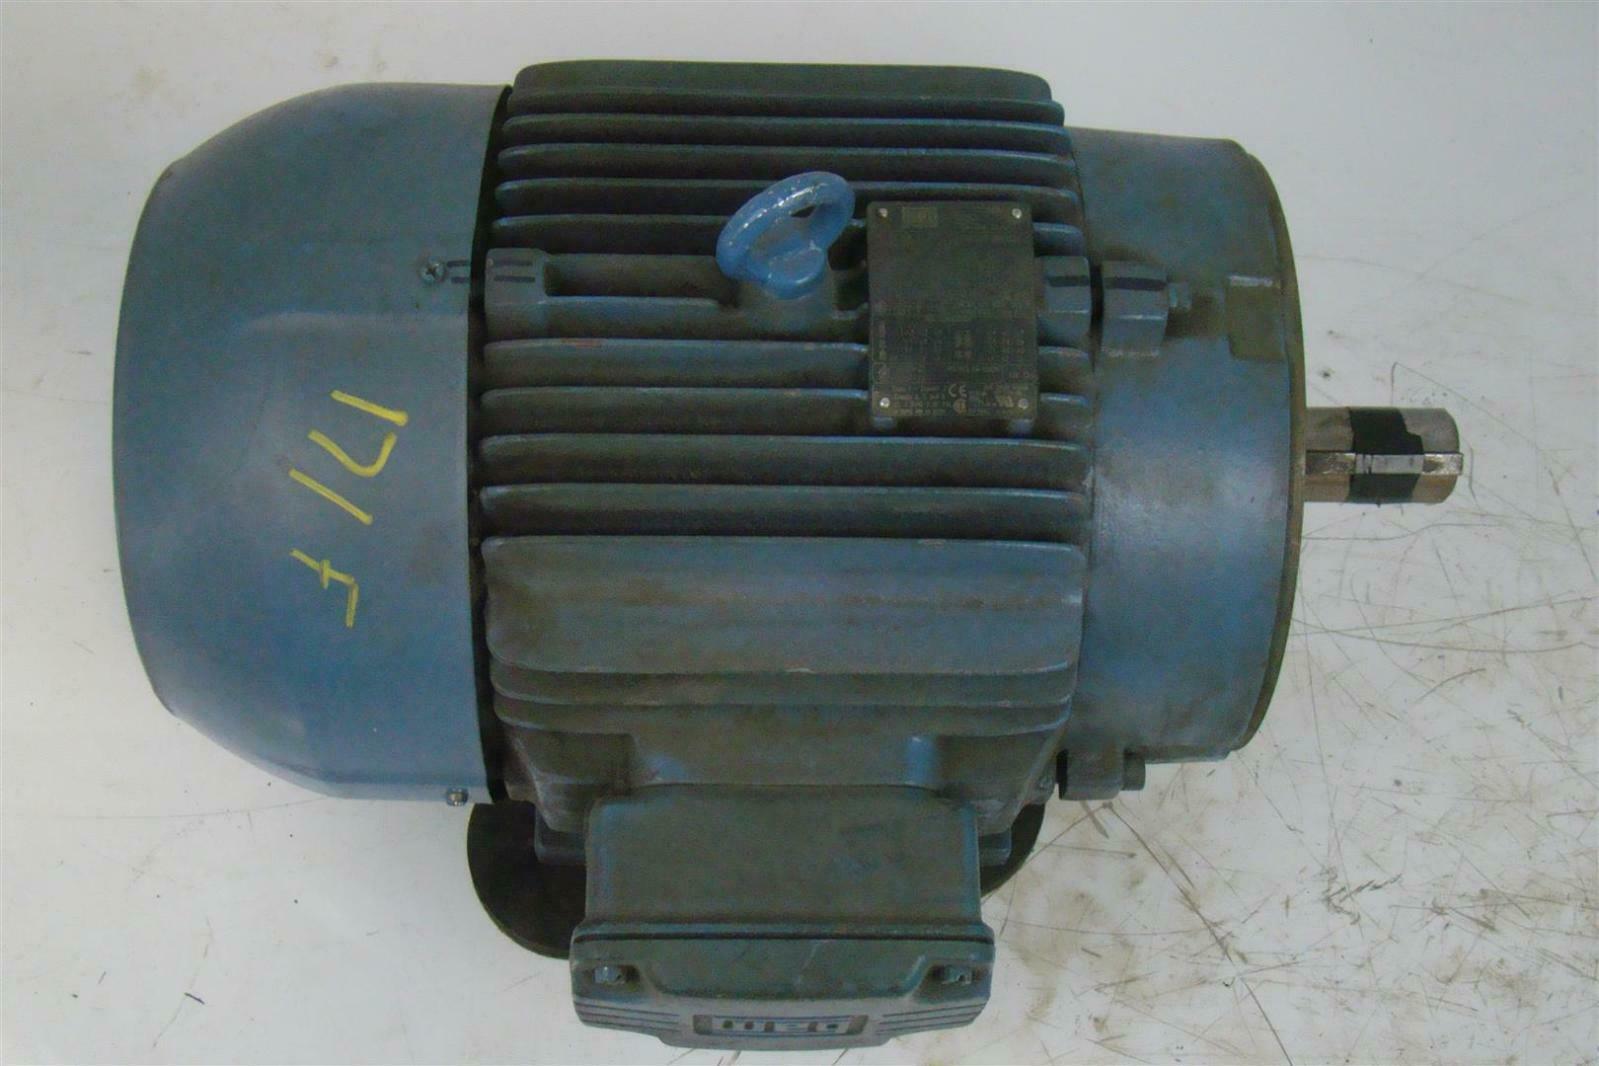 Weg motor 7 1 2hp w21 ph3 380 460v 2885 3515rpm w 375 for Weg severe duty motor